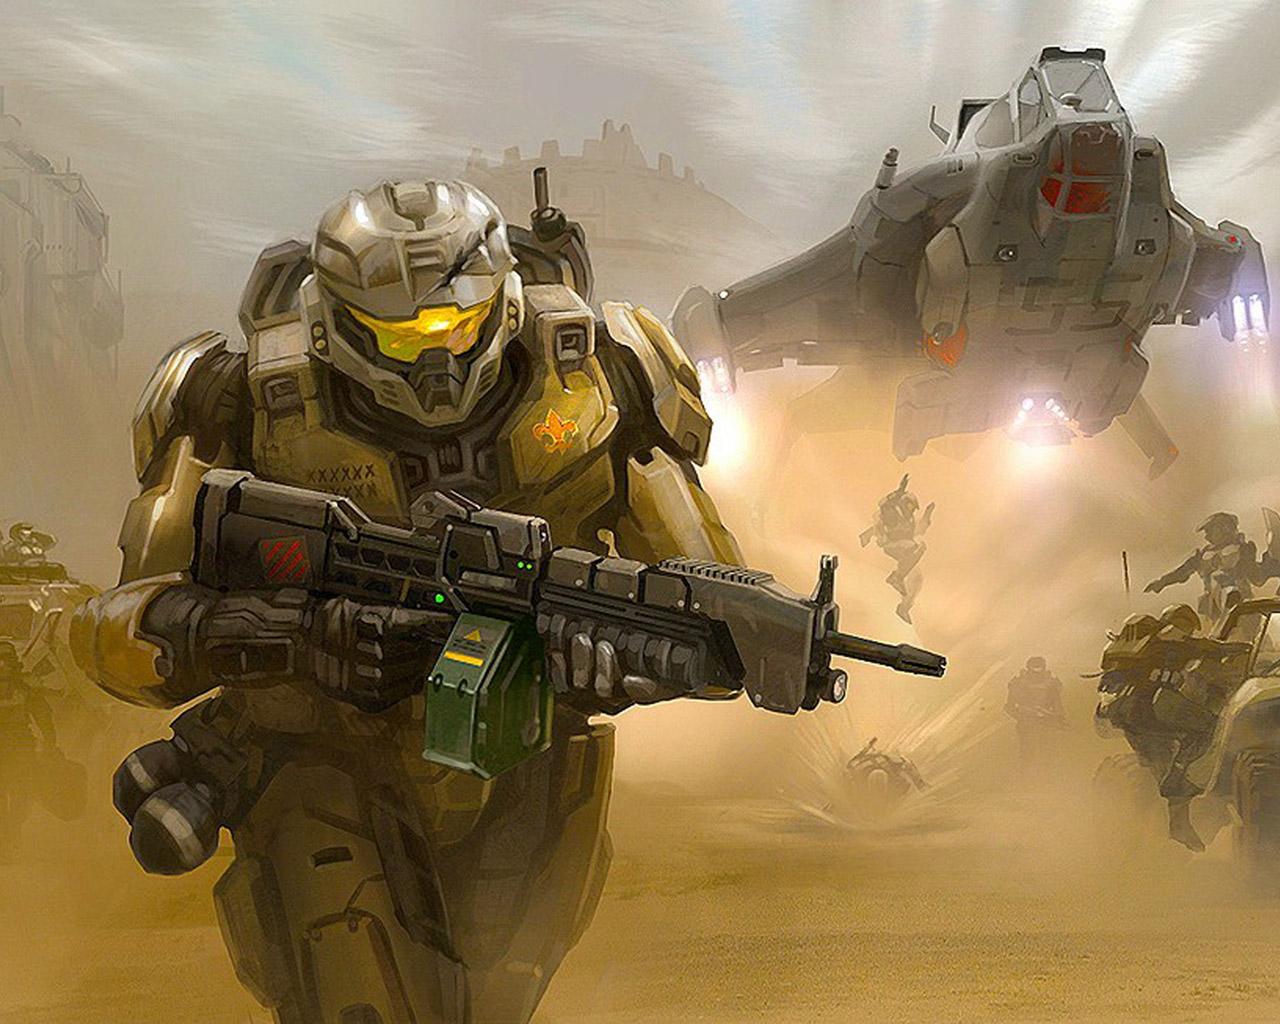 Halo: Reach Wallpaper in 1280x1024